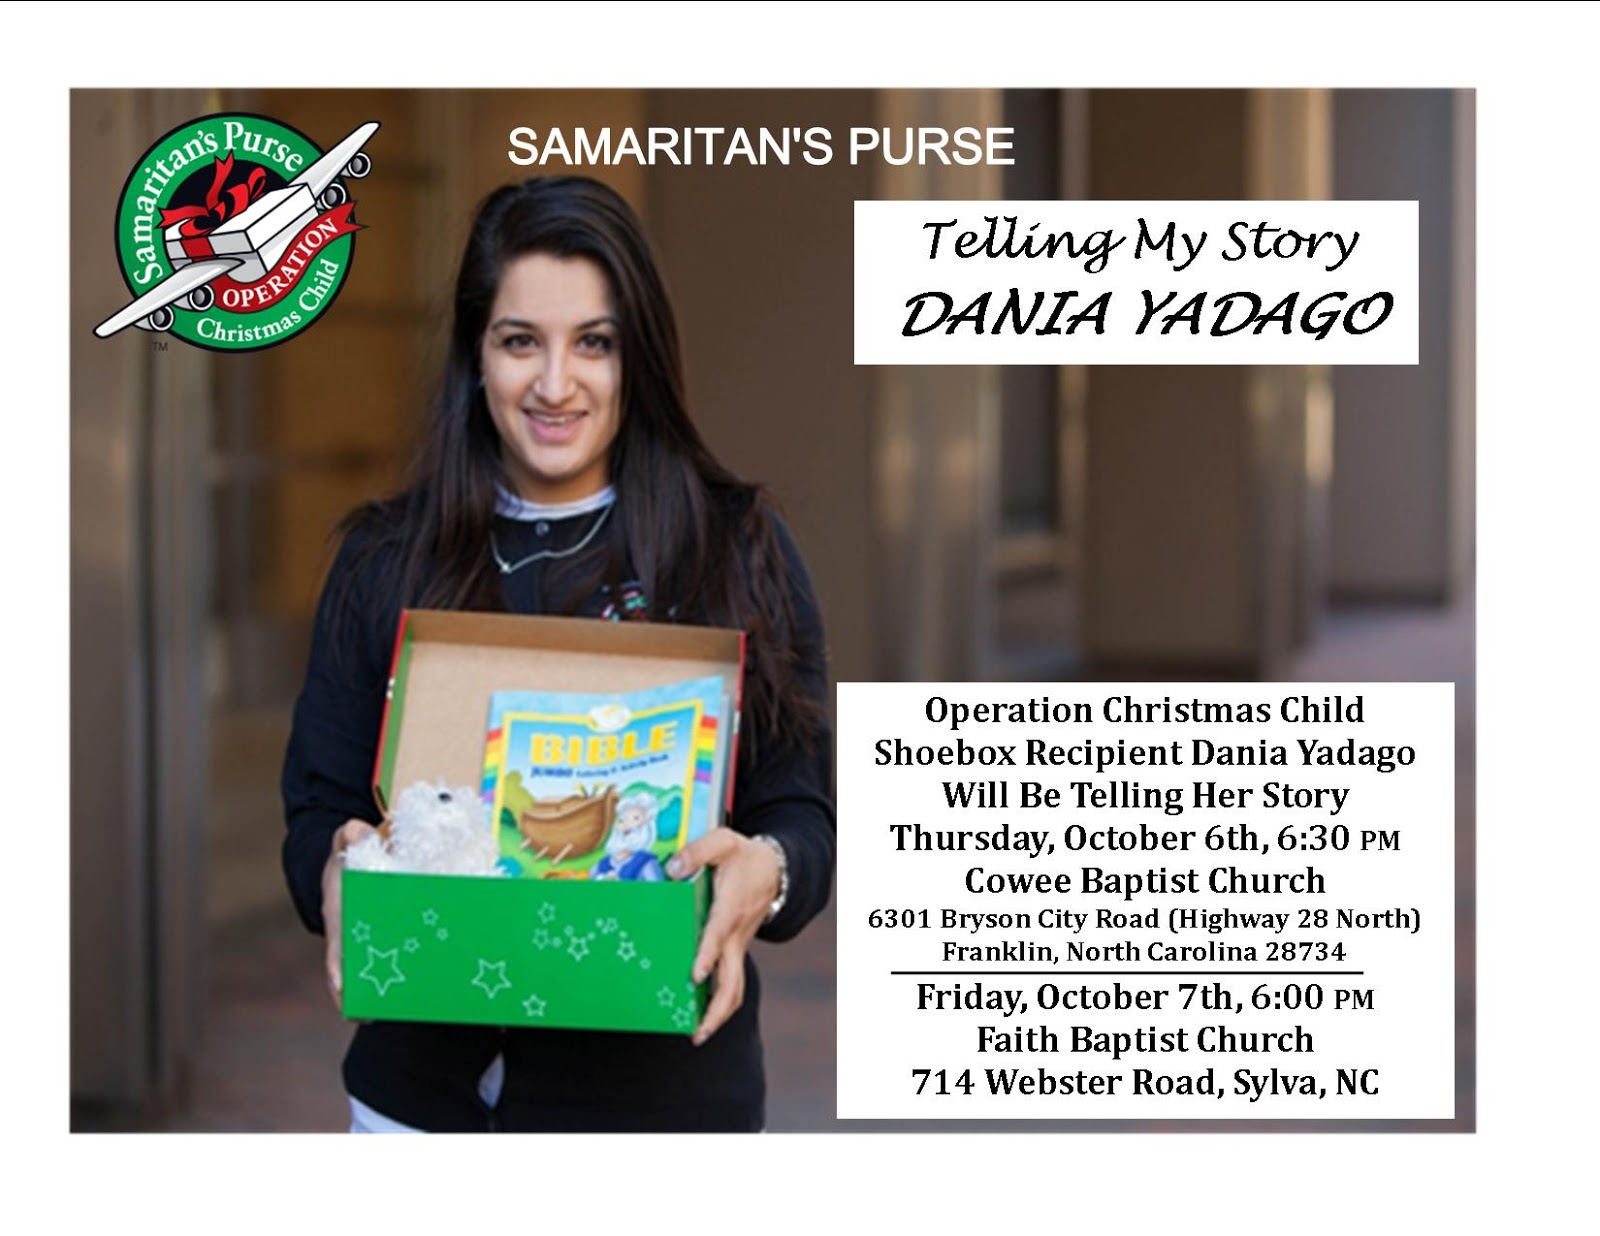 Operation Christmas Child Shoebox Recipient Dania Yadago Will Be ...